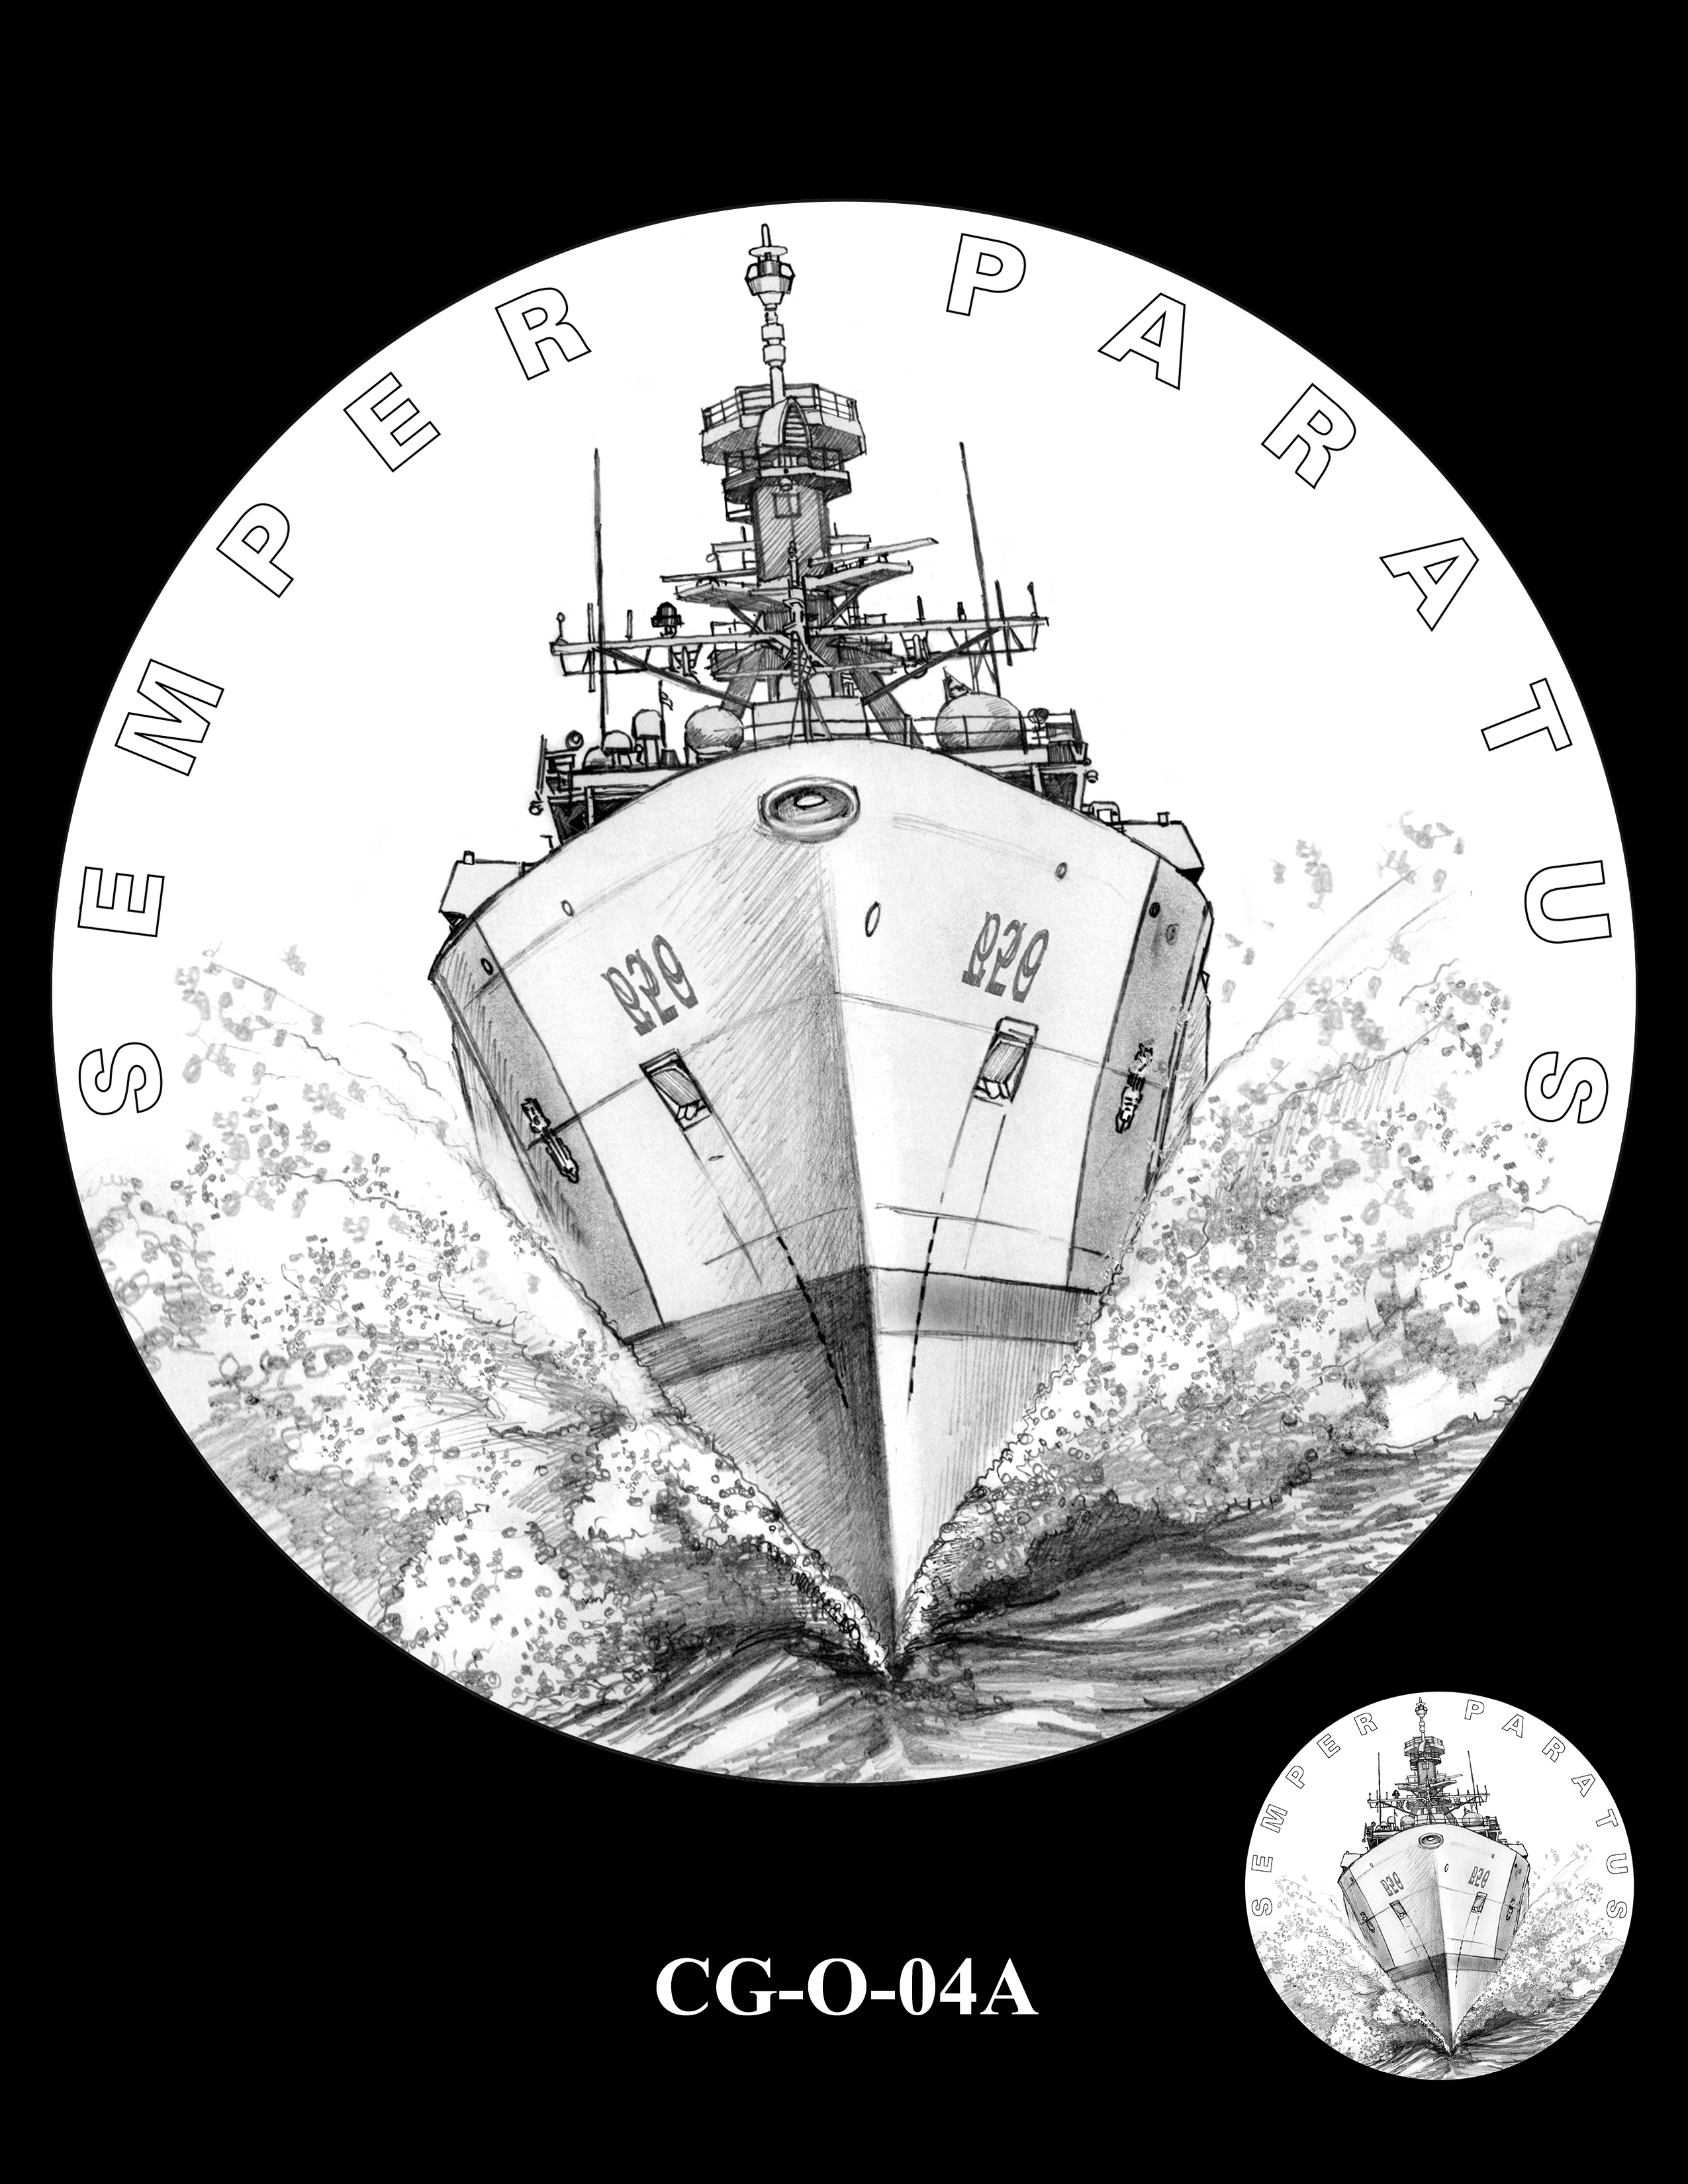 CG-O-04A -- Armed Forces Medal - Coast Guard